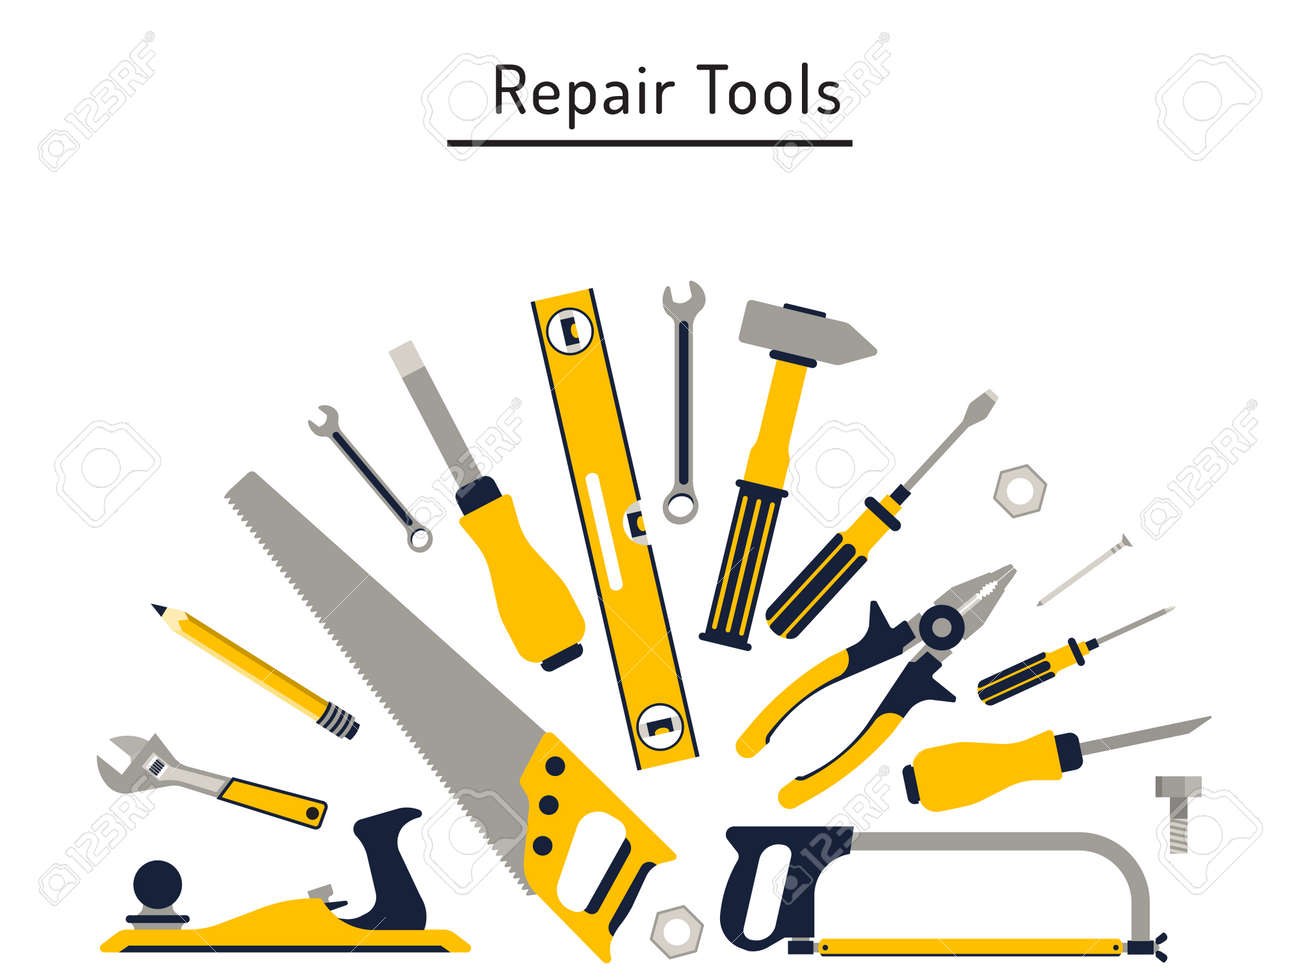 Construction repair tools flat icon set. Tools like hammer, axe, ruler, hatchet home repair. Isolated tools flat set. - 55724564